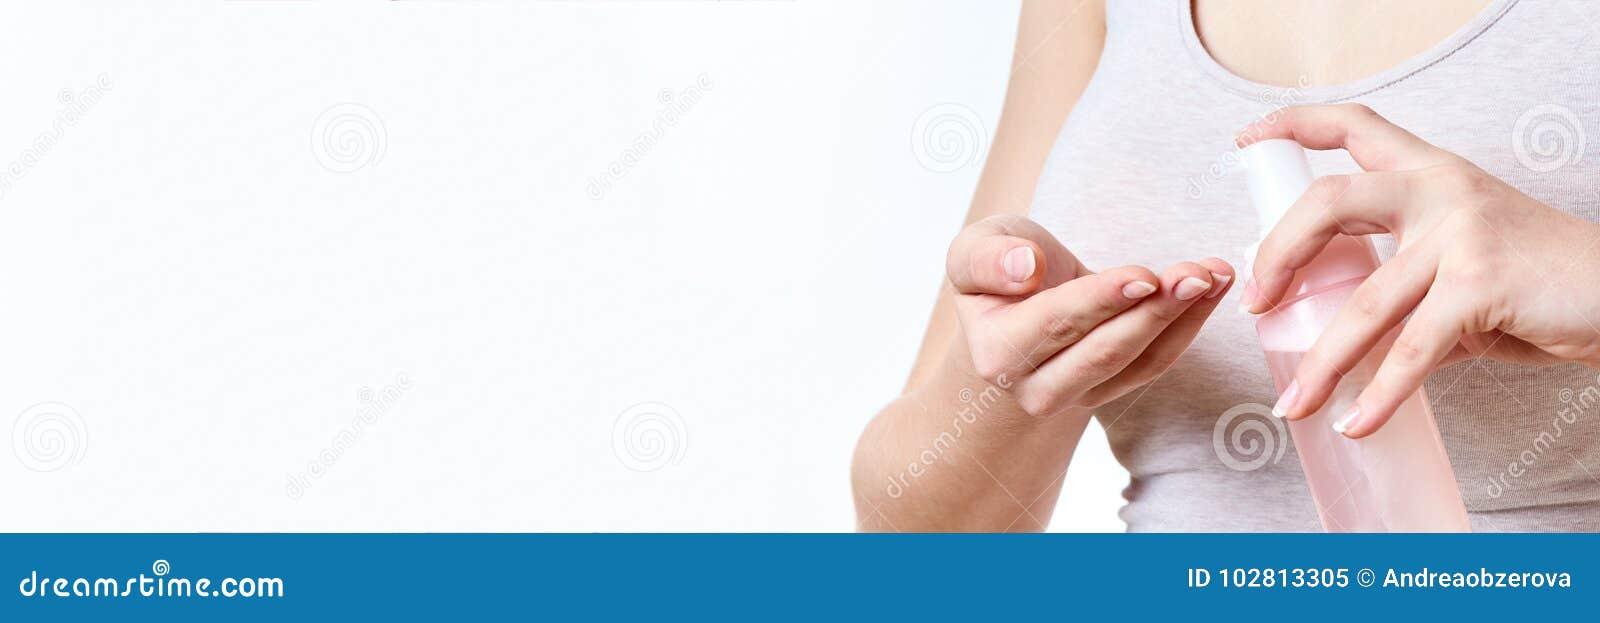 Skincare面对洗涤的概念 拿着瓶起泡沫的清洁剂的无法认出的妇女